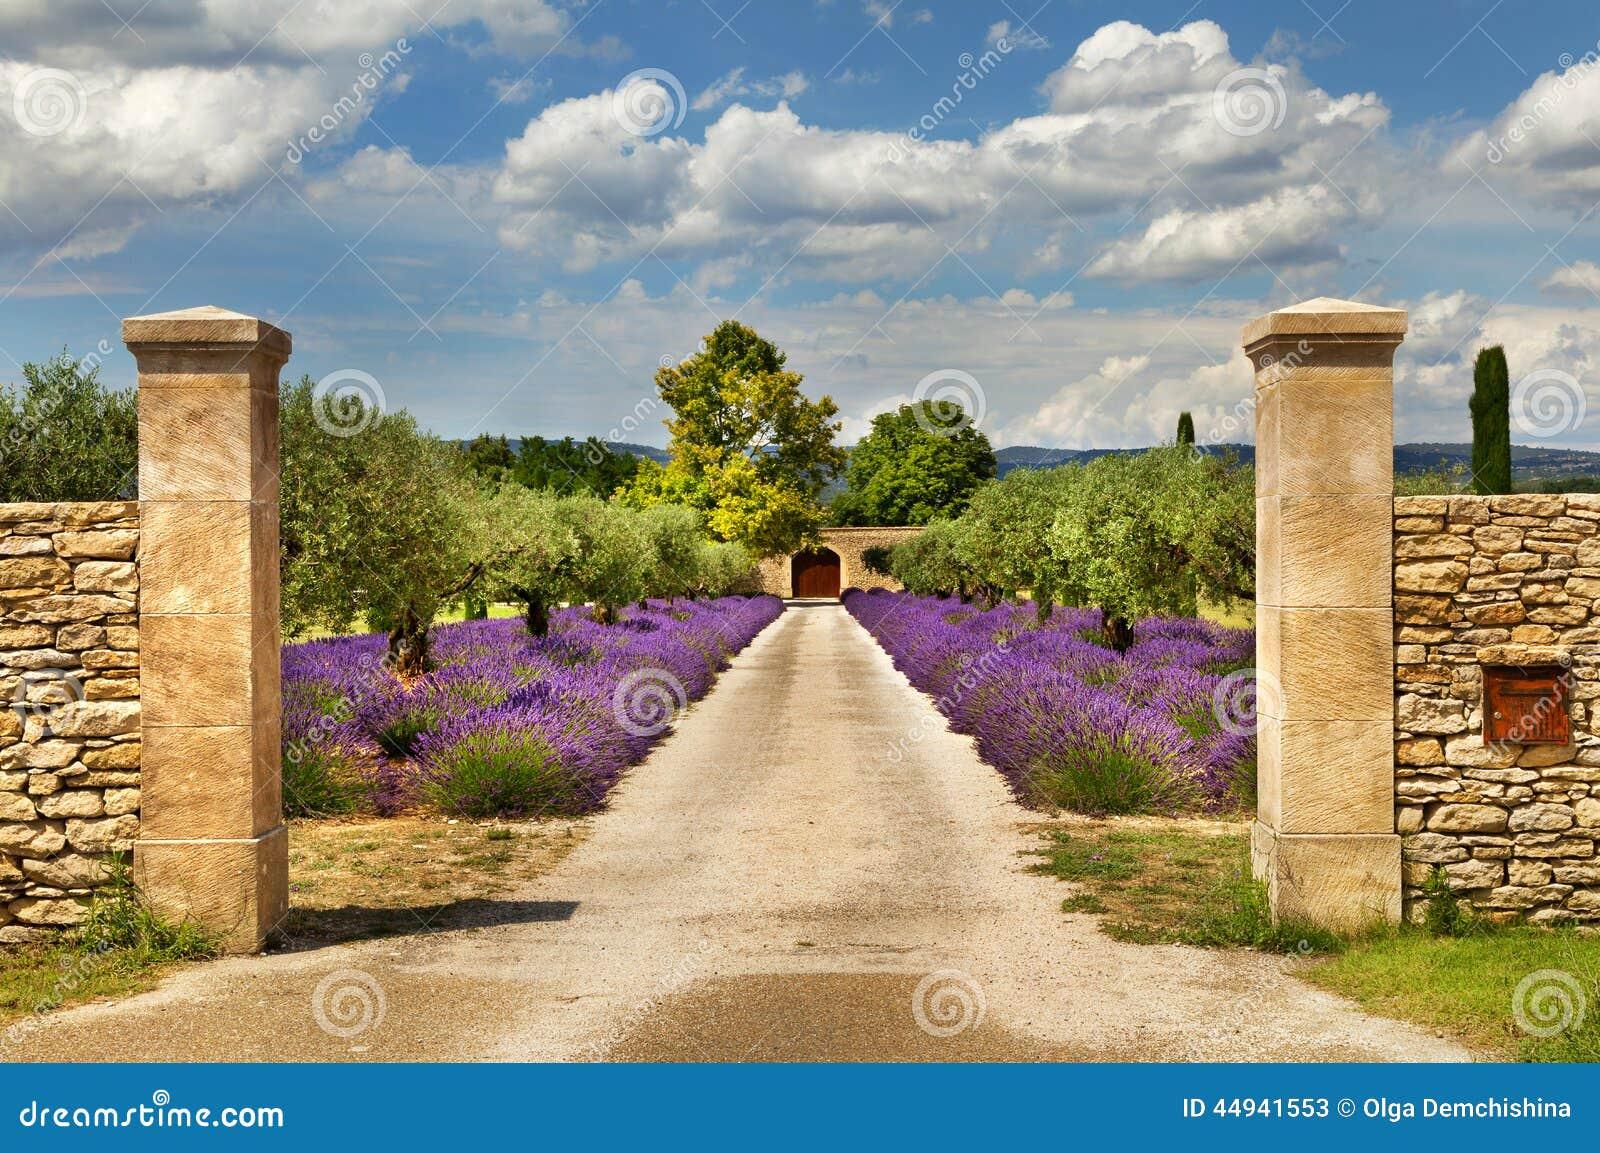 weg mit lavendel in provence stockbild bild von eingang lavendel 44941553. Black Bedroom Furniture Sets. Home Design Ideas